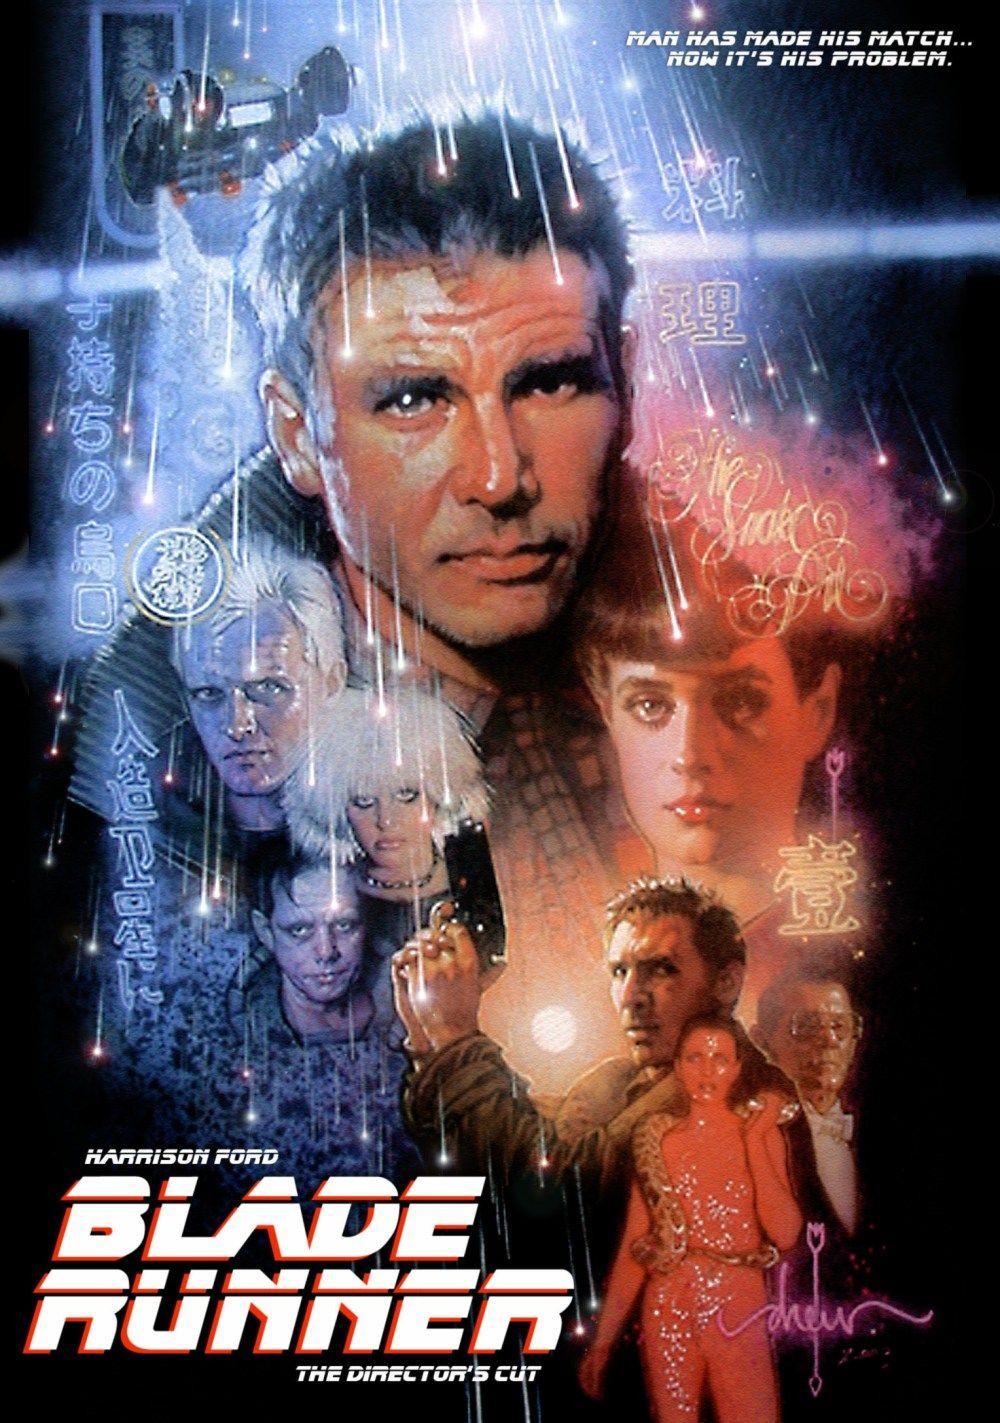 Resenha do filme Blade Runner (1982) - Meta Galáxia | Blade runner, Posters  de filmes, Filmes